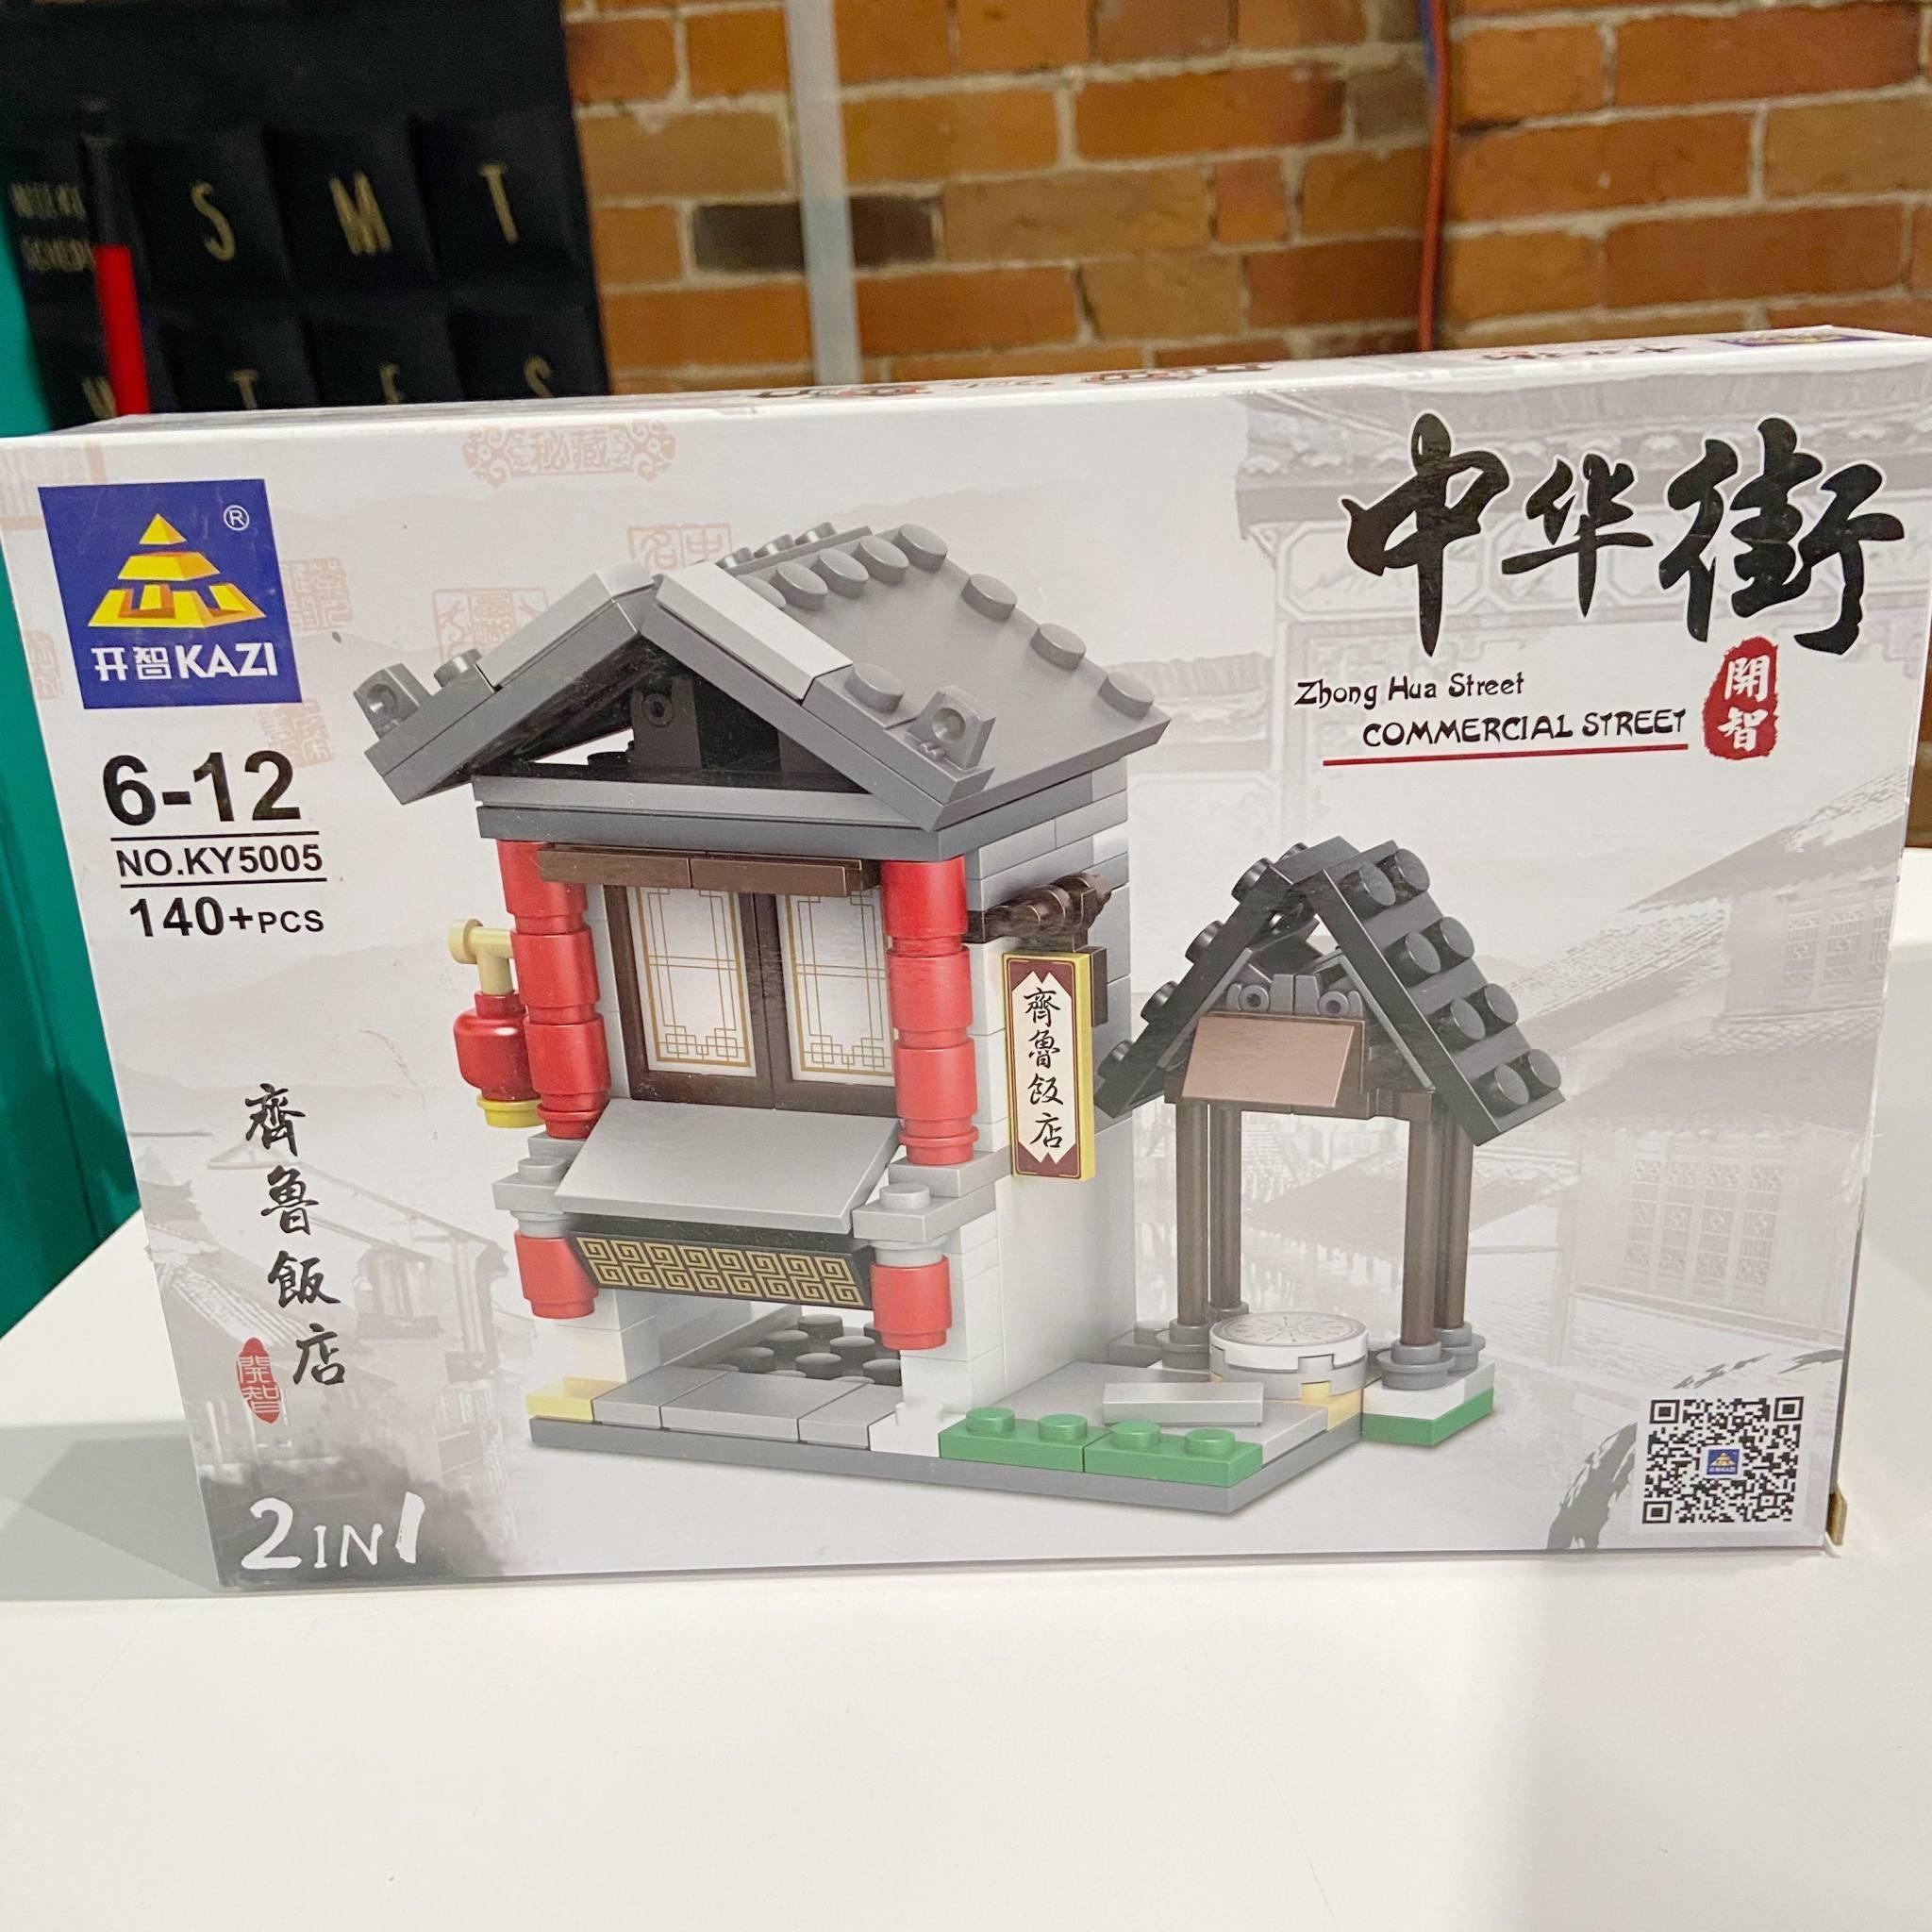 KY5005 China Town Building Blocks